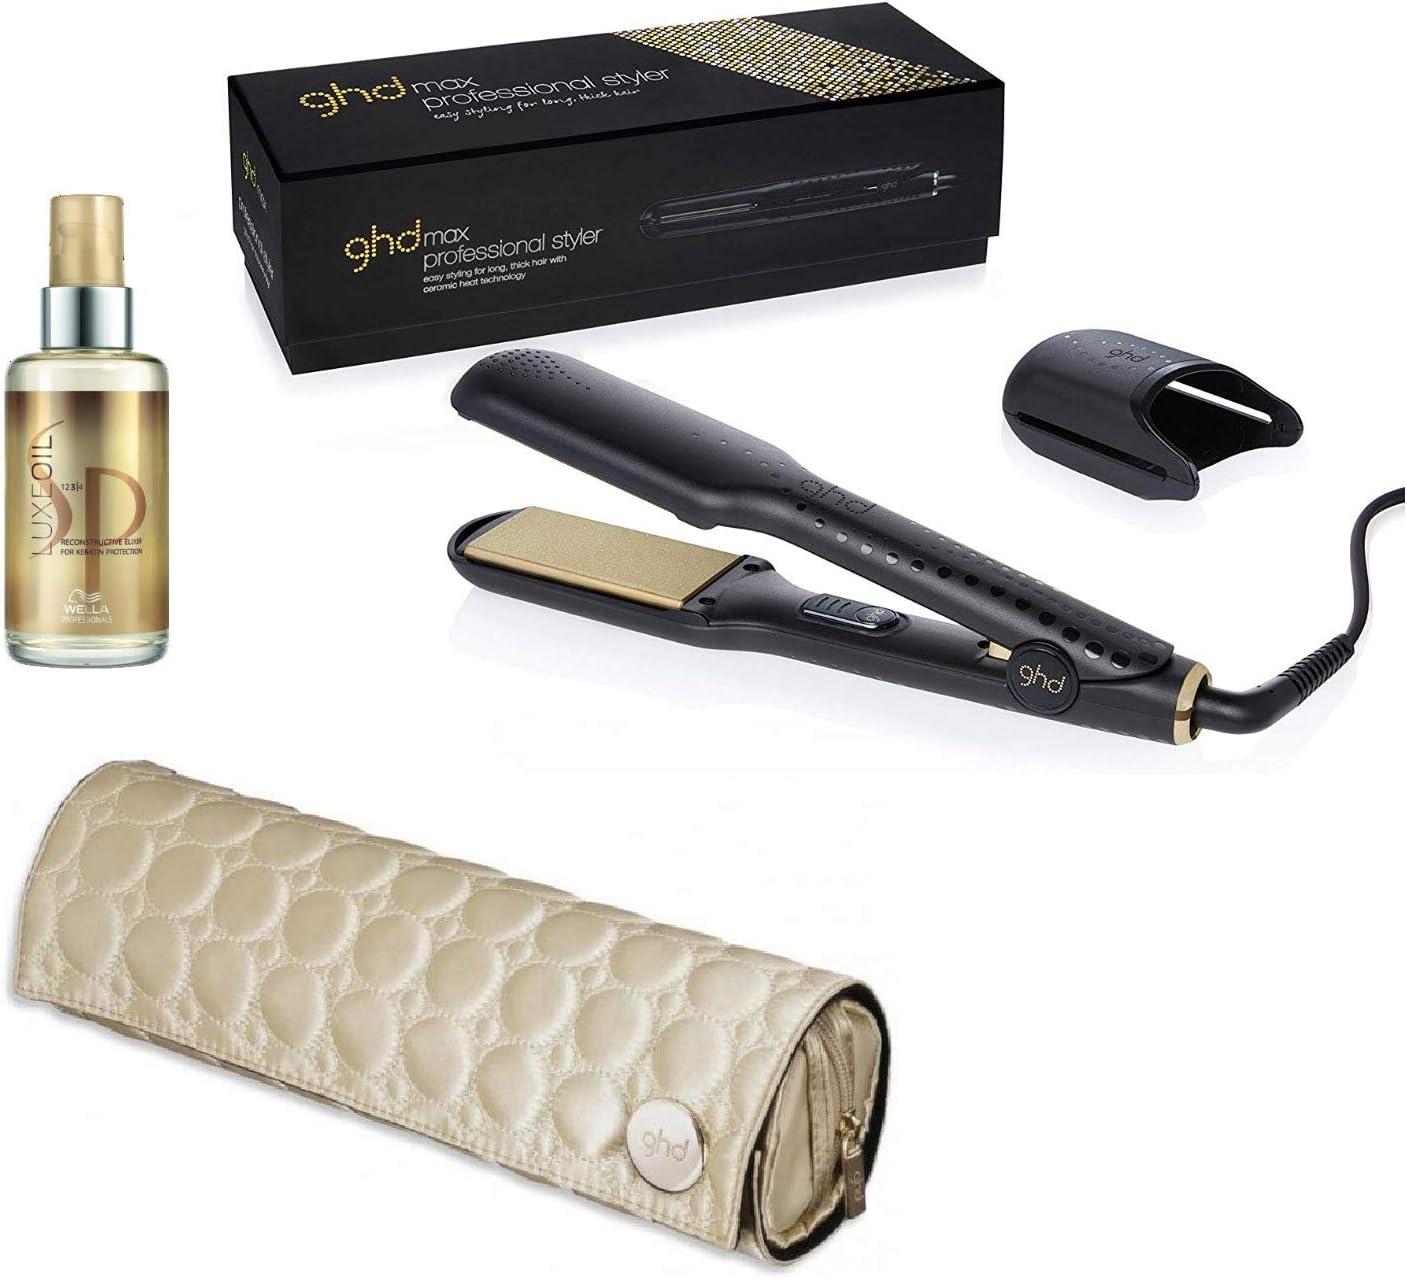 Plato ancho plancha alisador de cabello/ghd Max Stylers w/Gold Heatmap/Case & Wella SP Reconstructive Luxe Oil Set de regalo